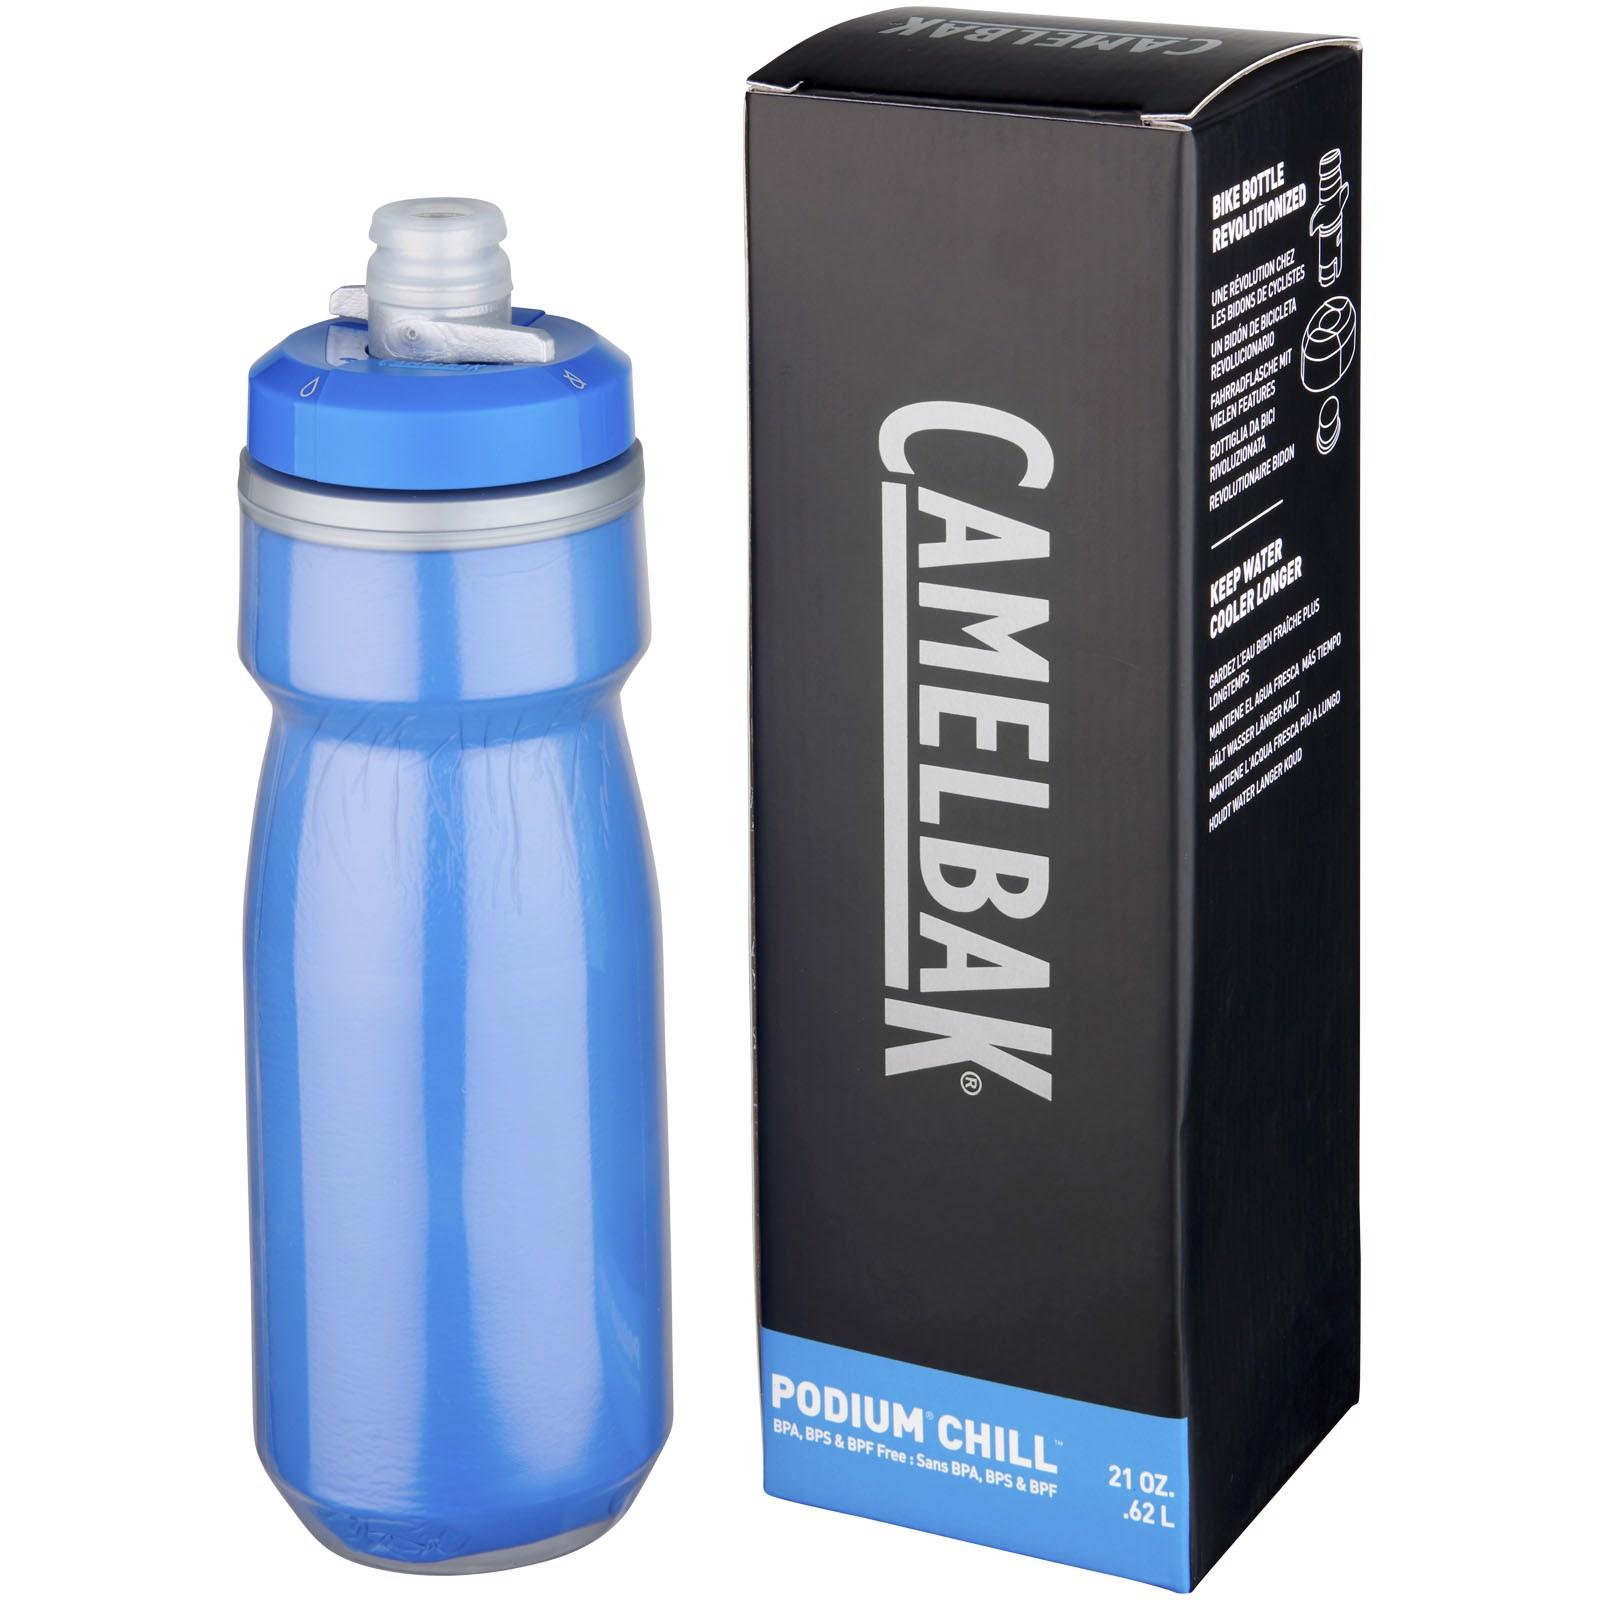 Podium Chill 620 ml sport bottle - Royal blue